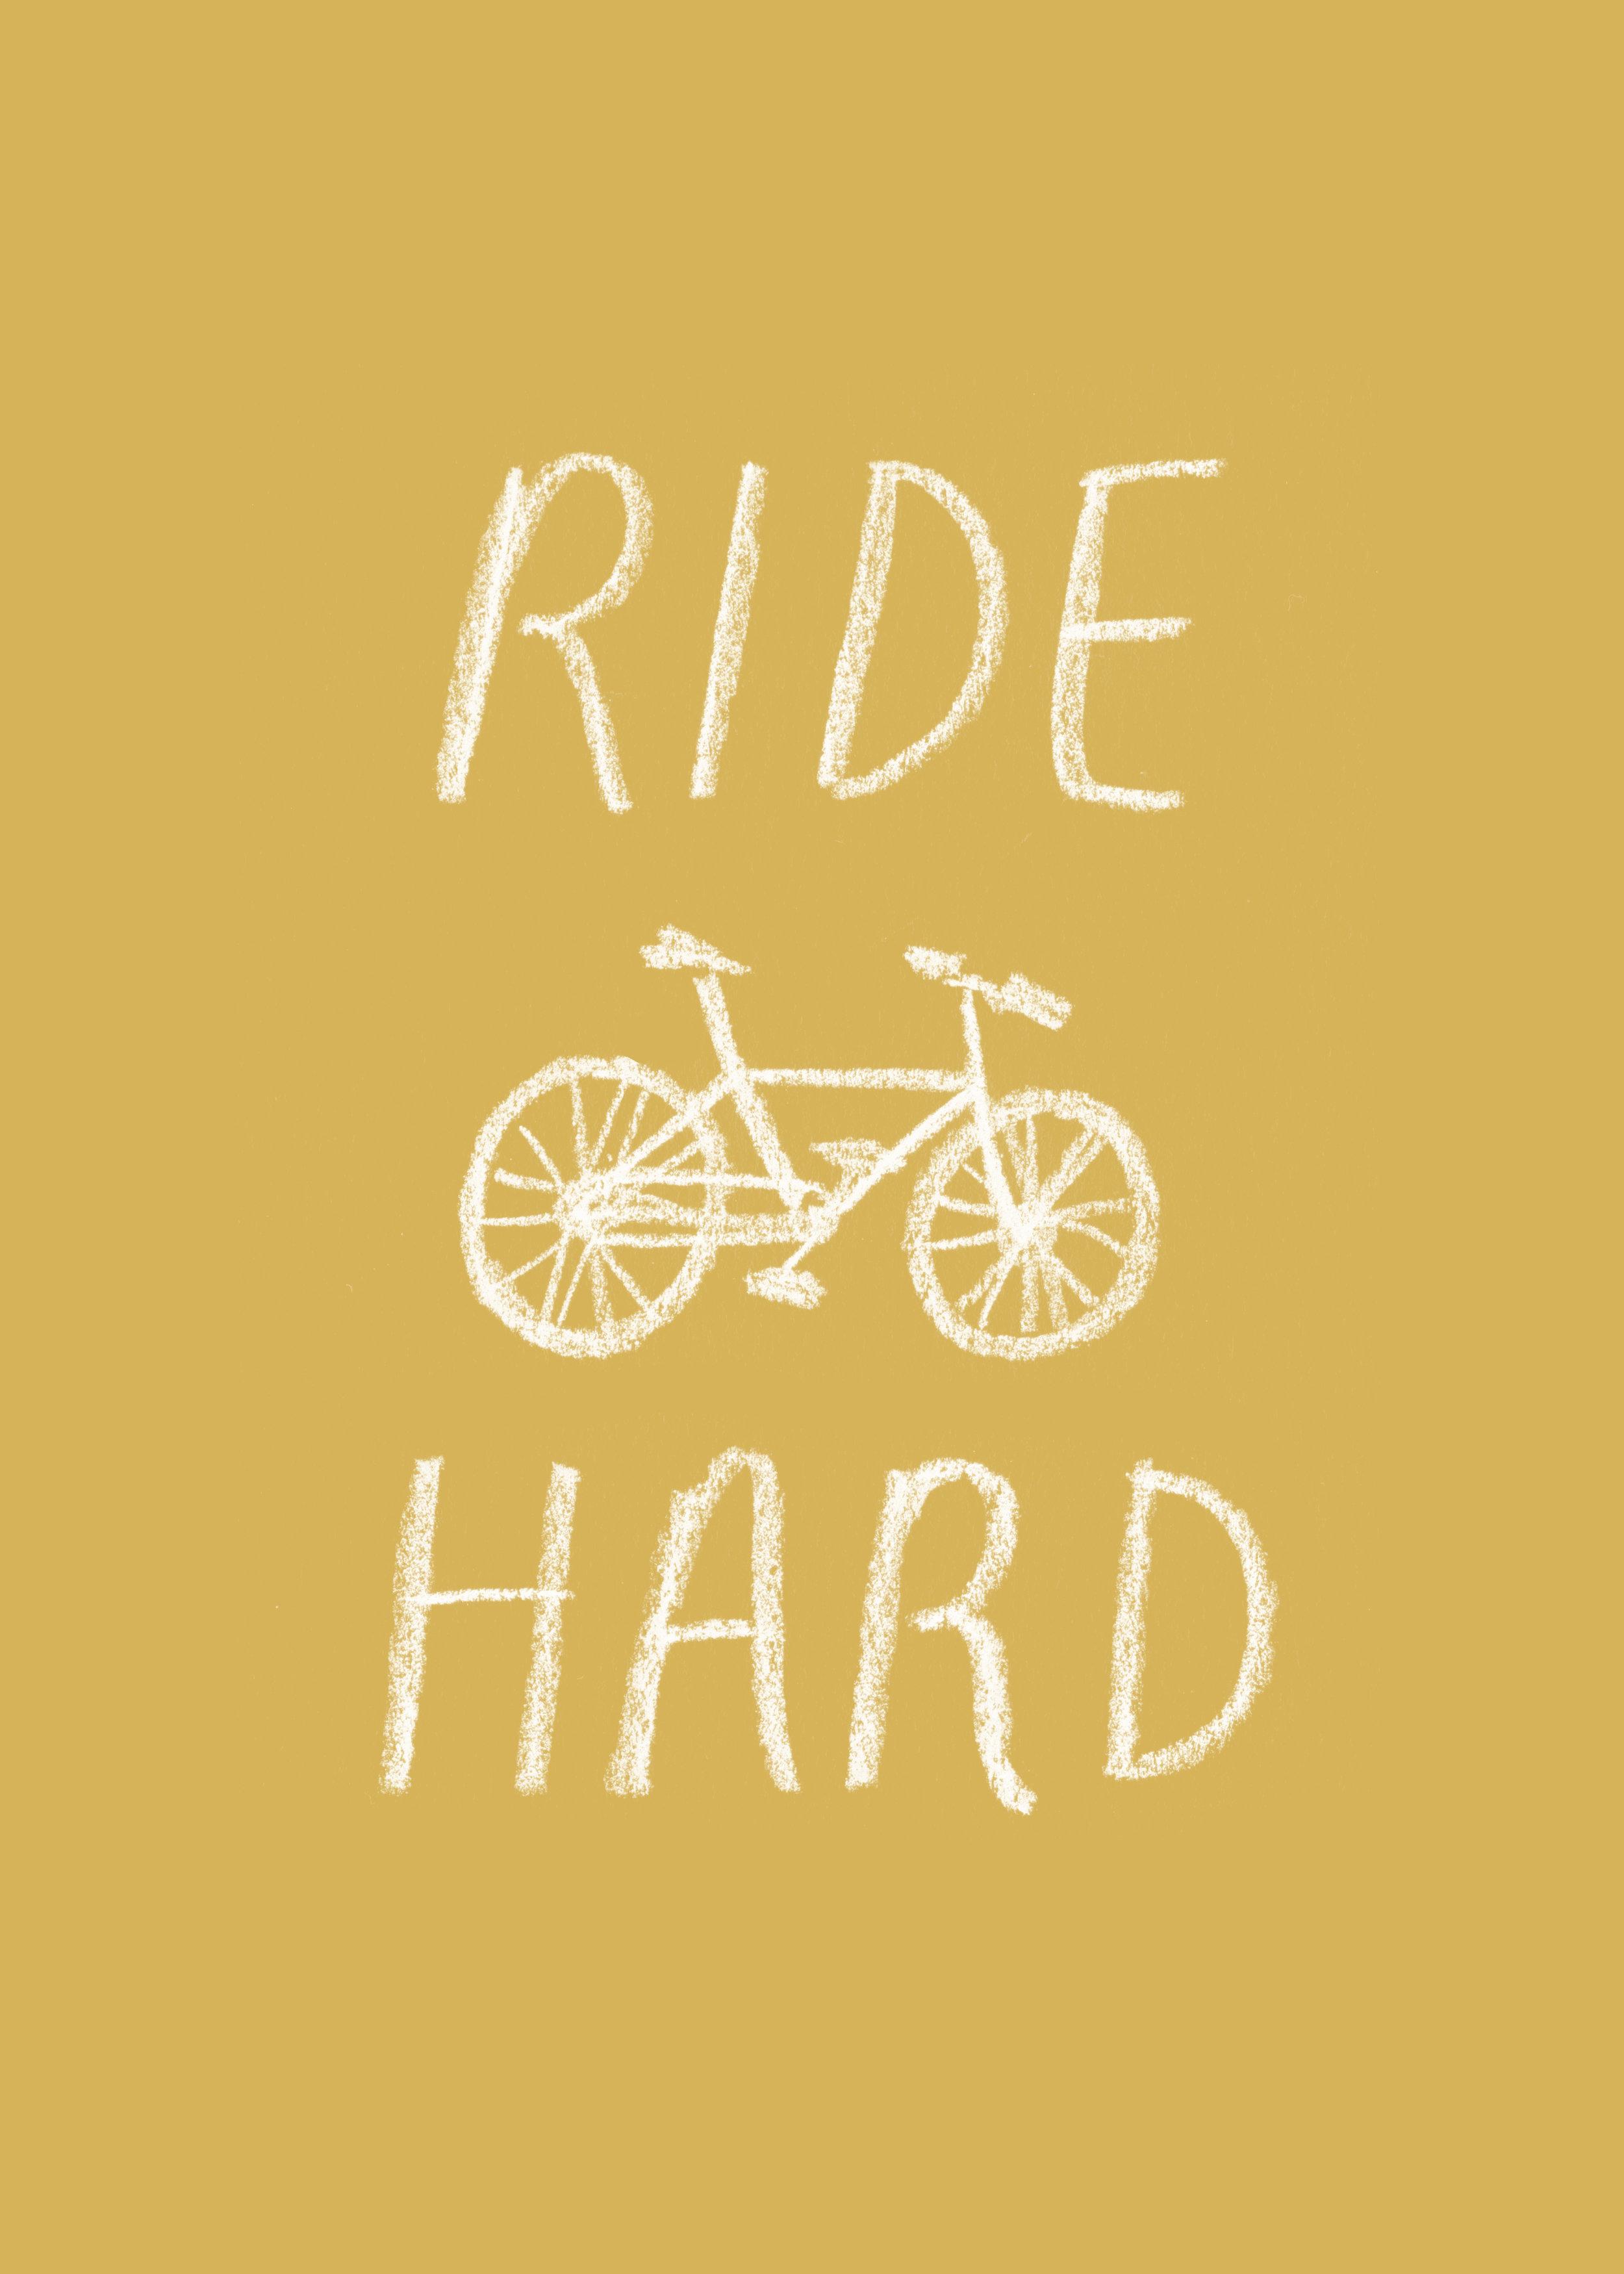 RideHard-web2.jpg